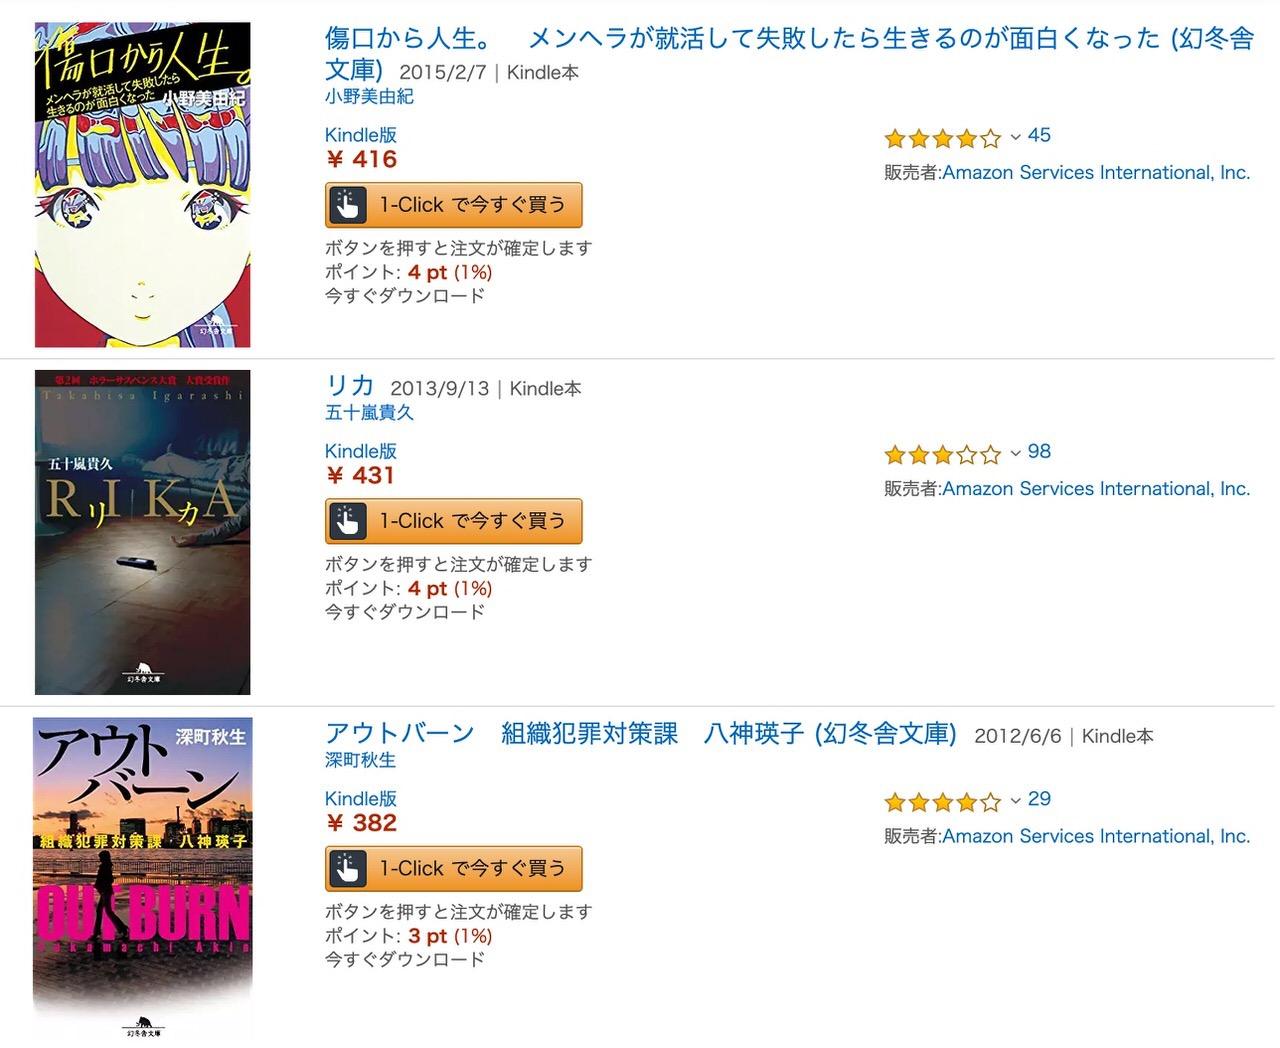 【Kindleセール】最大75%オフ!約300冊が対象「幻冬舎文庫フェア」(4/25まで)